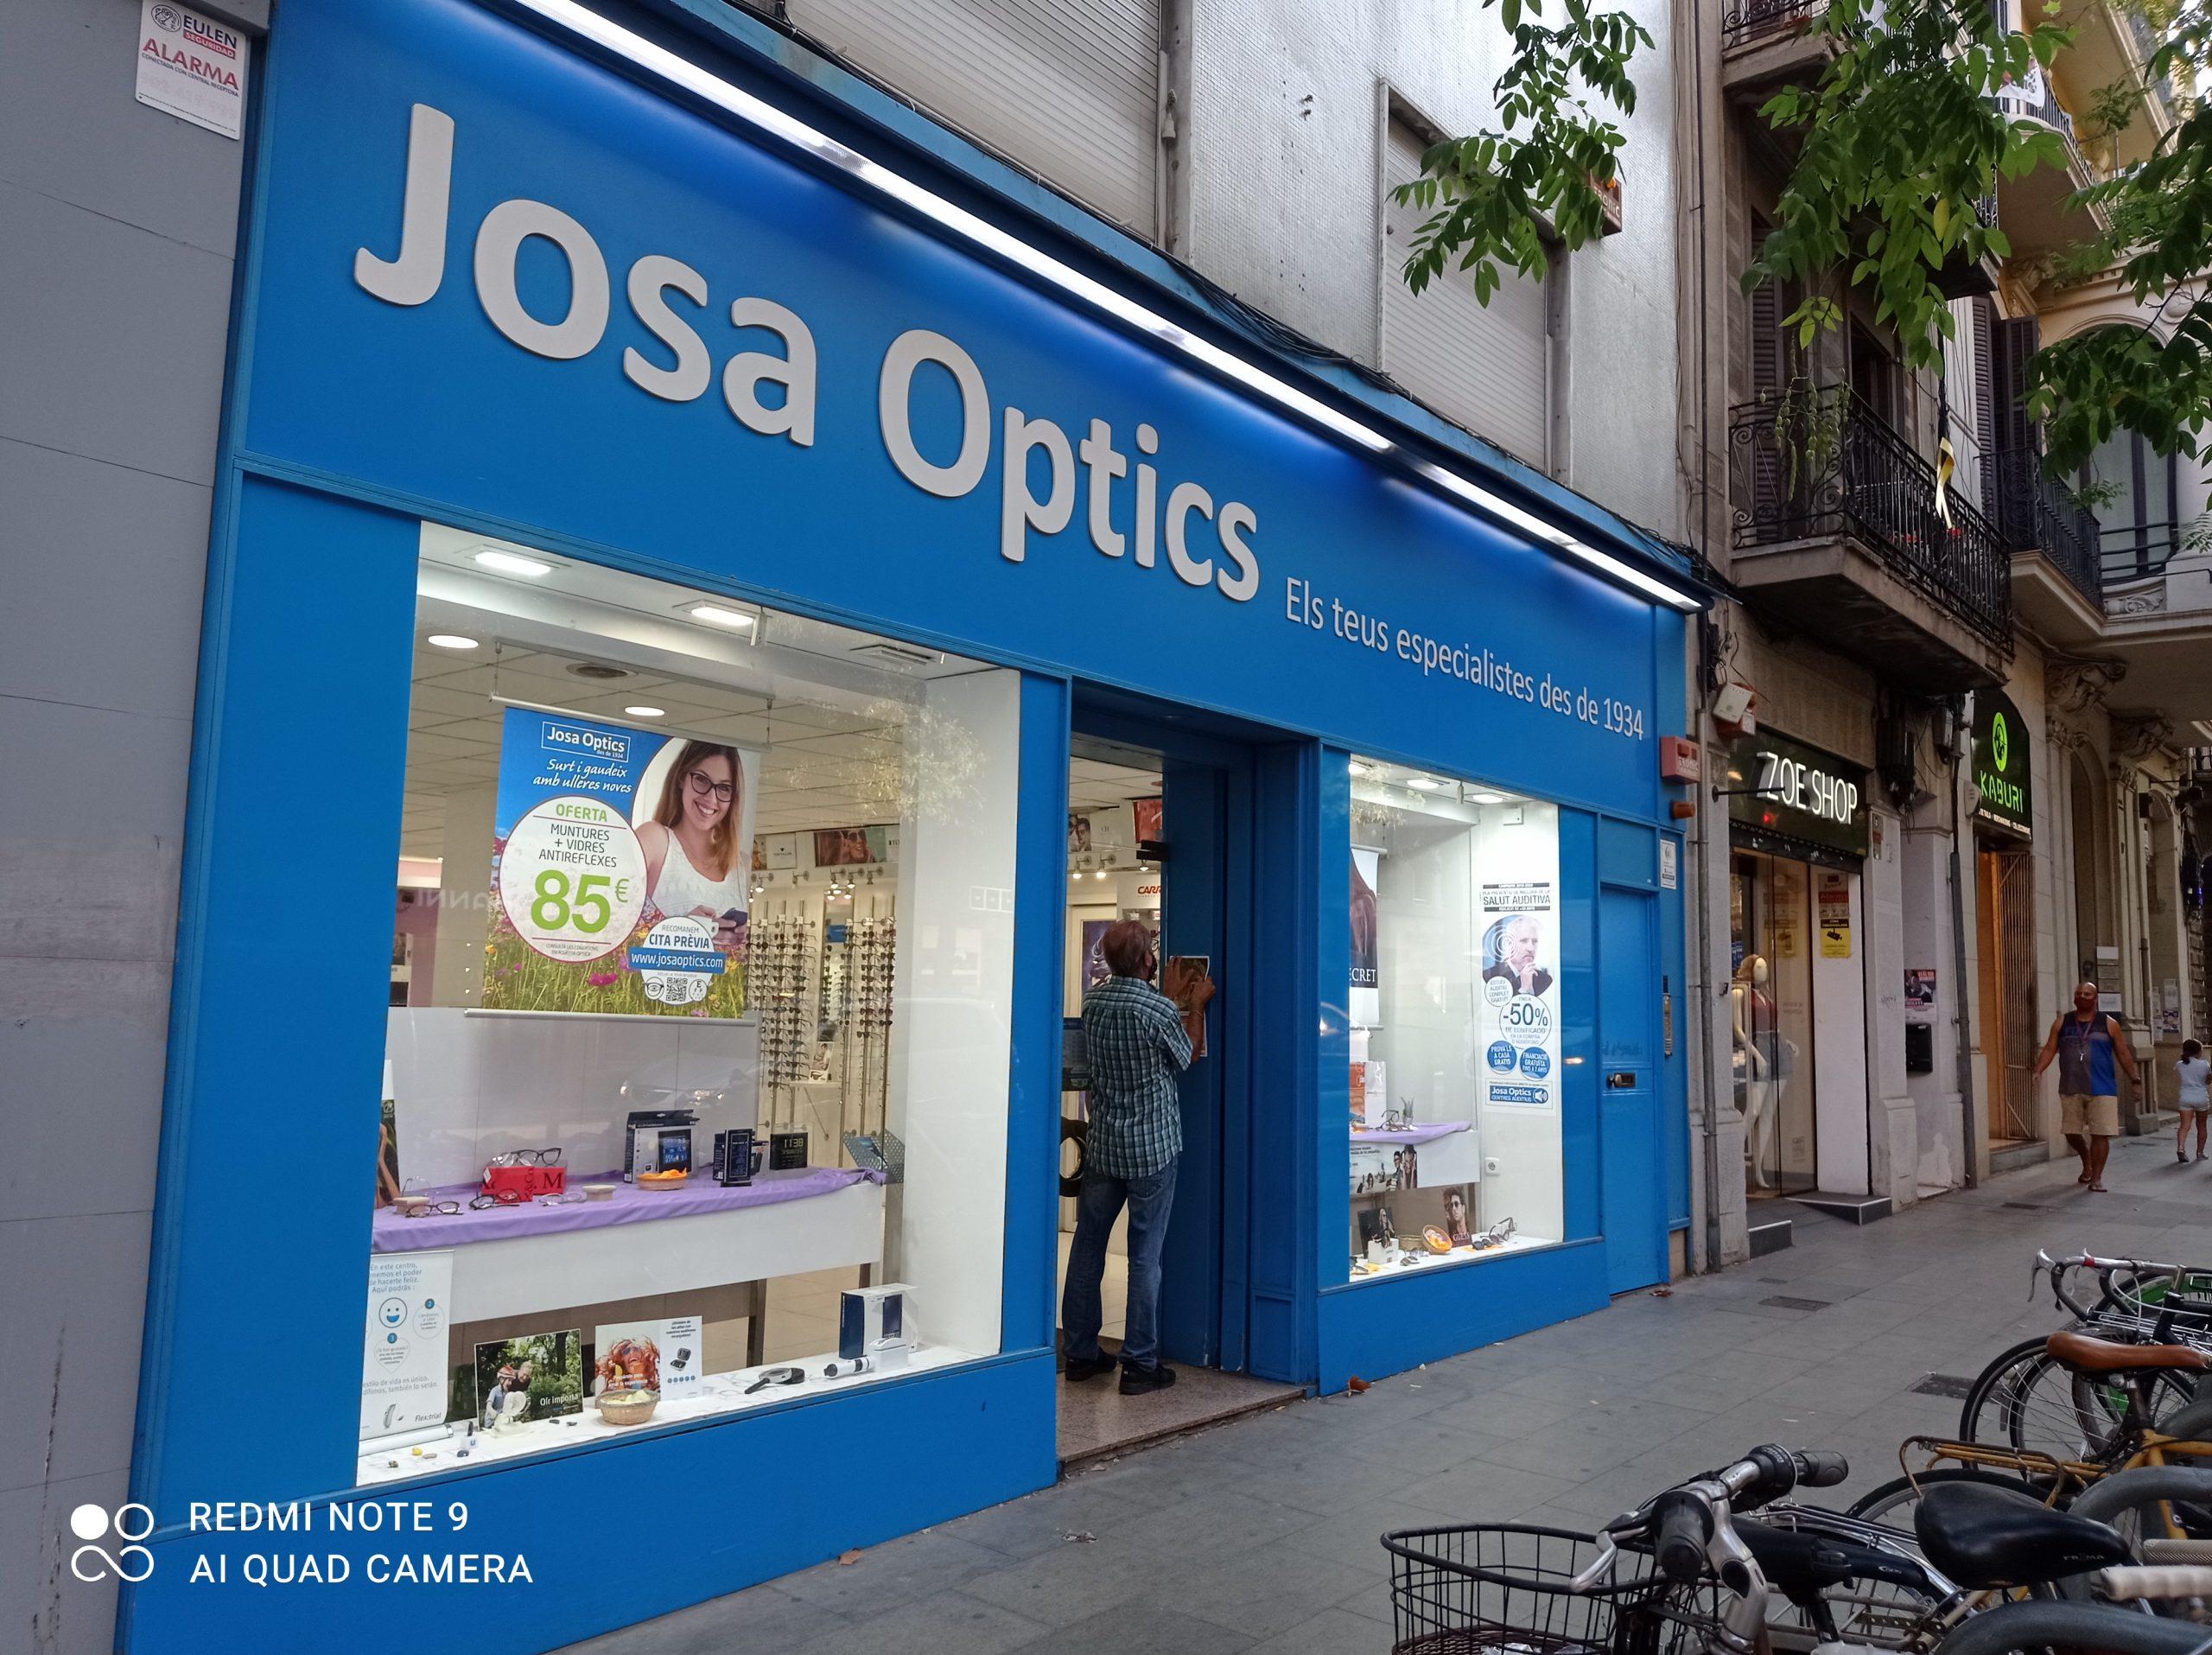 Josa Optics